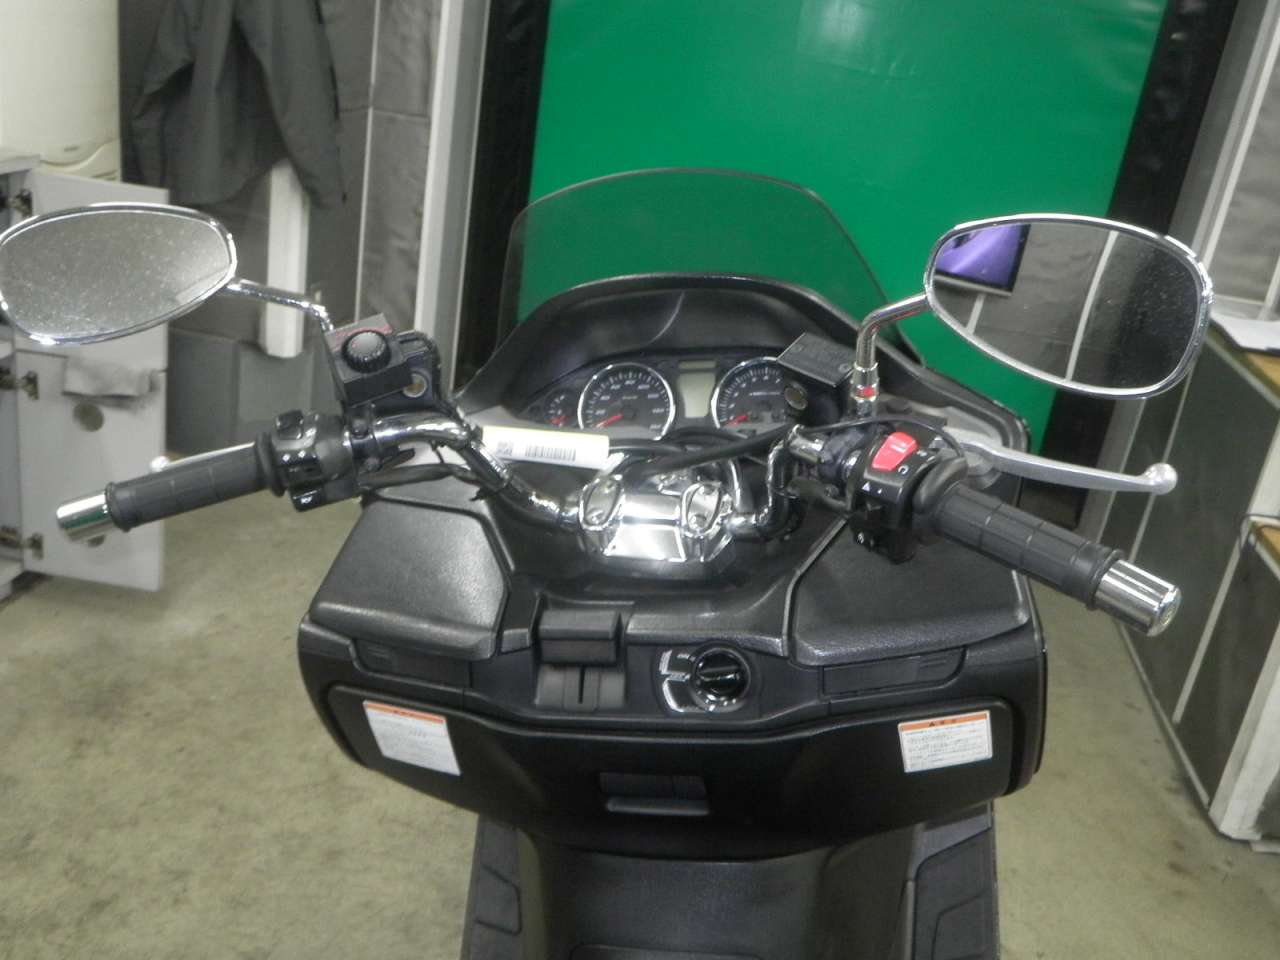 МАКСИ-СКУТЕР SUZUKI SKYWAVE 250S CJ46A  Артмото - купить квадроцикл в украине и харькове, мотоцикл, снегоход, скутер, мопед, электромобиль